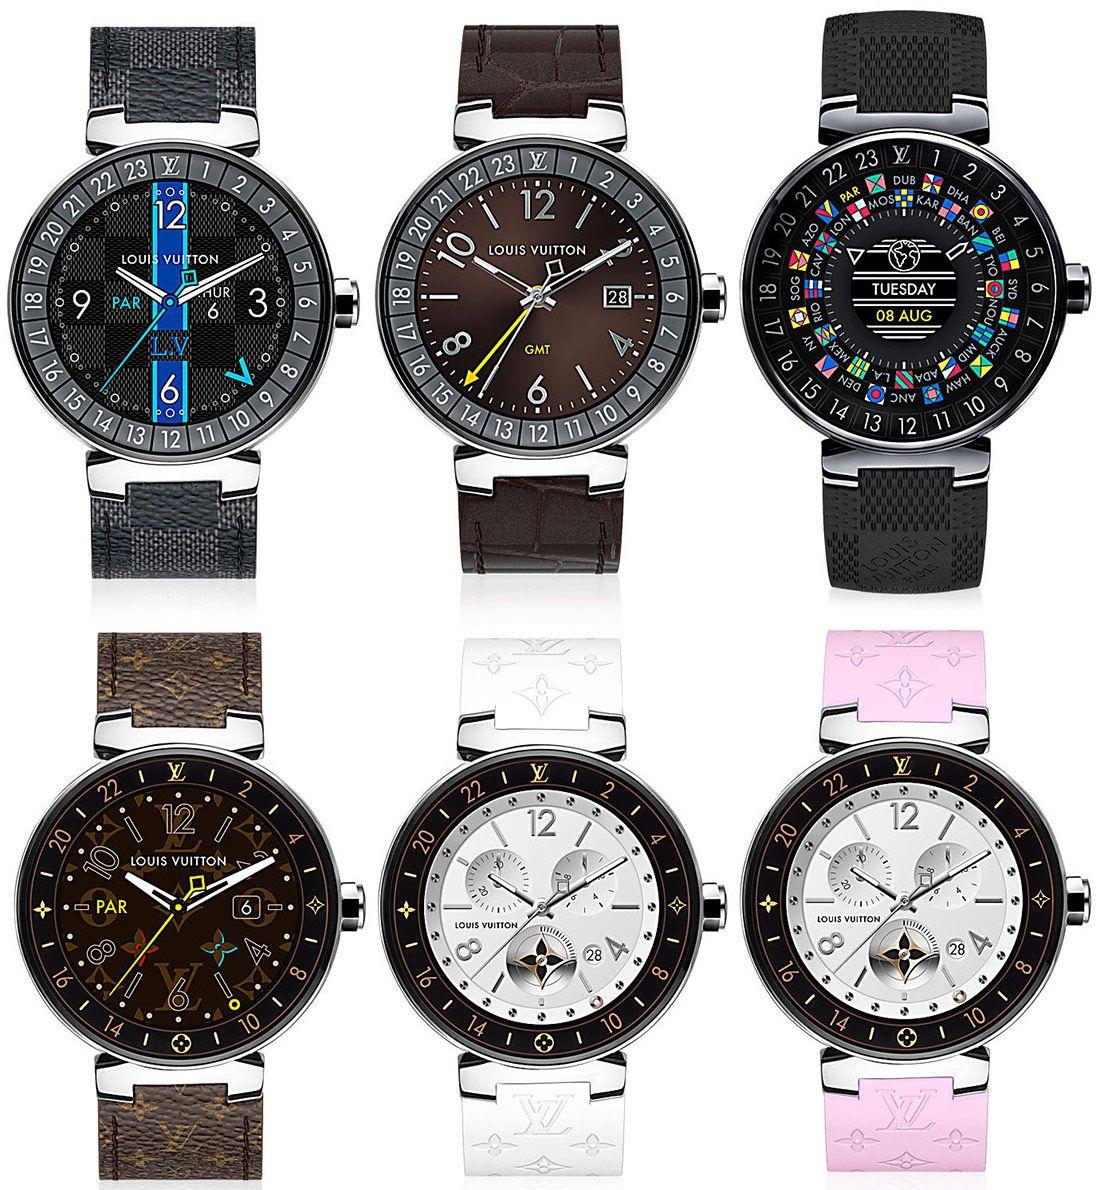 6e37d5676466 Louis Vuitton Tambour Horizon Smartwatch